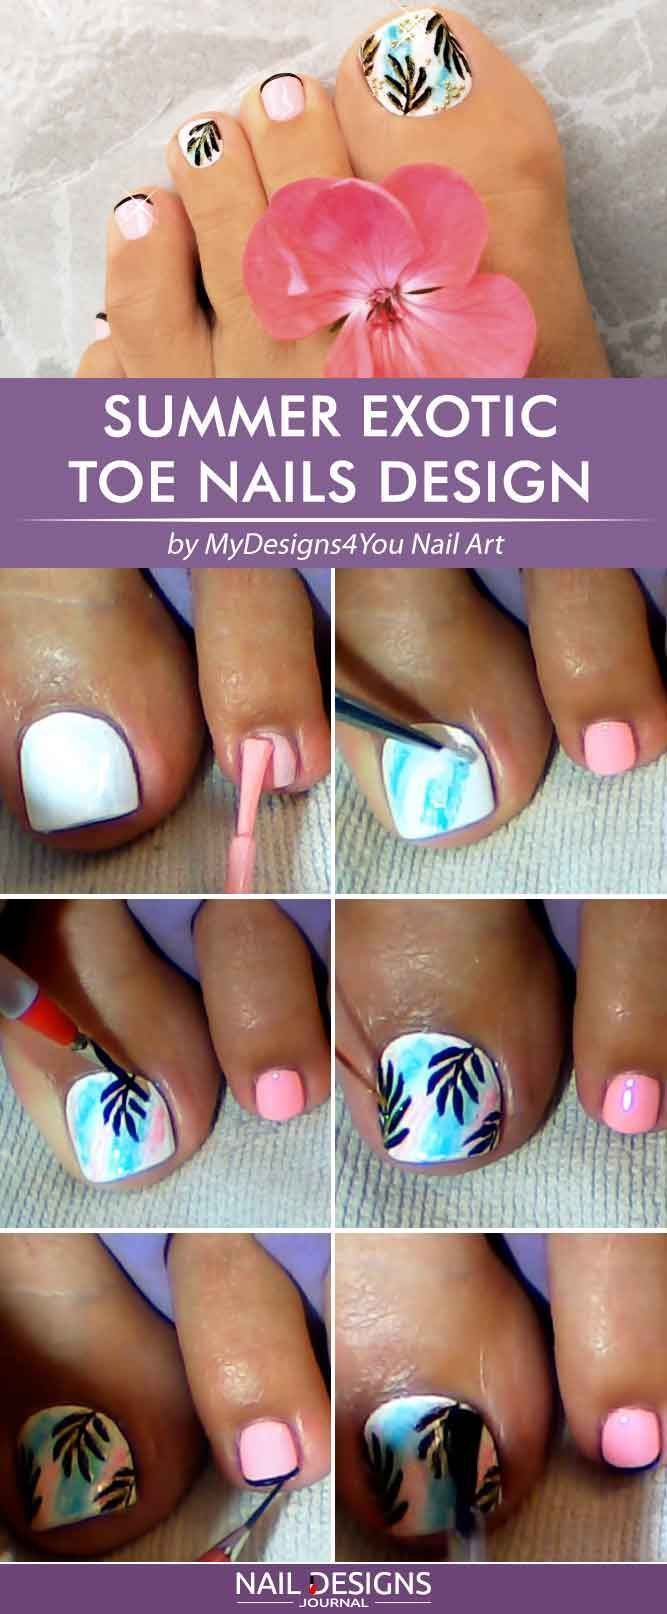 Diy Toe Nail Designs Easy Ideas For Beginers Diy Nail Designs